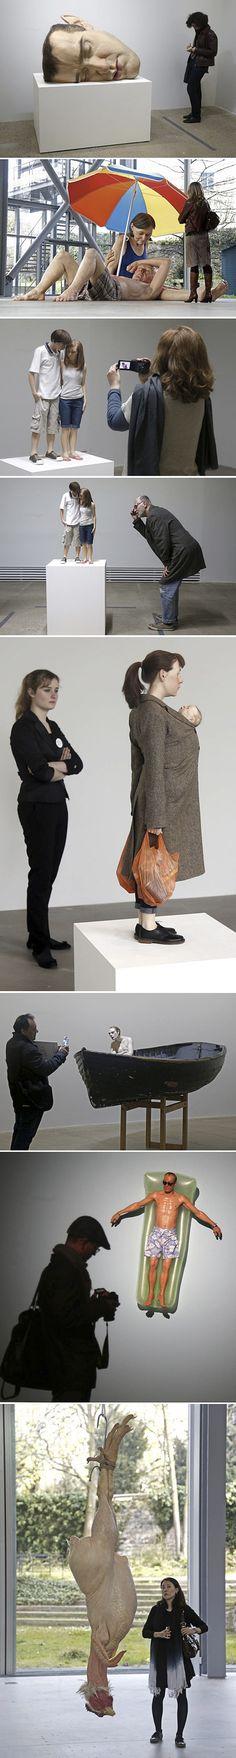 Ron Mueck : Hyper-Realistic Sculptures